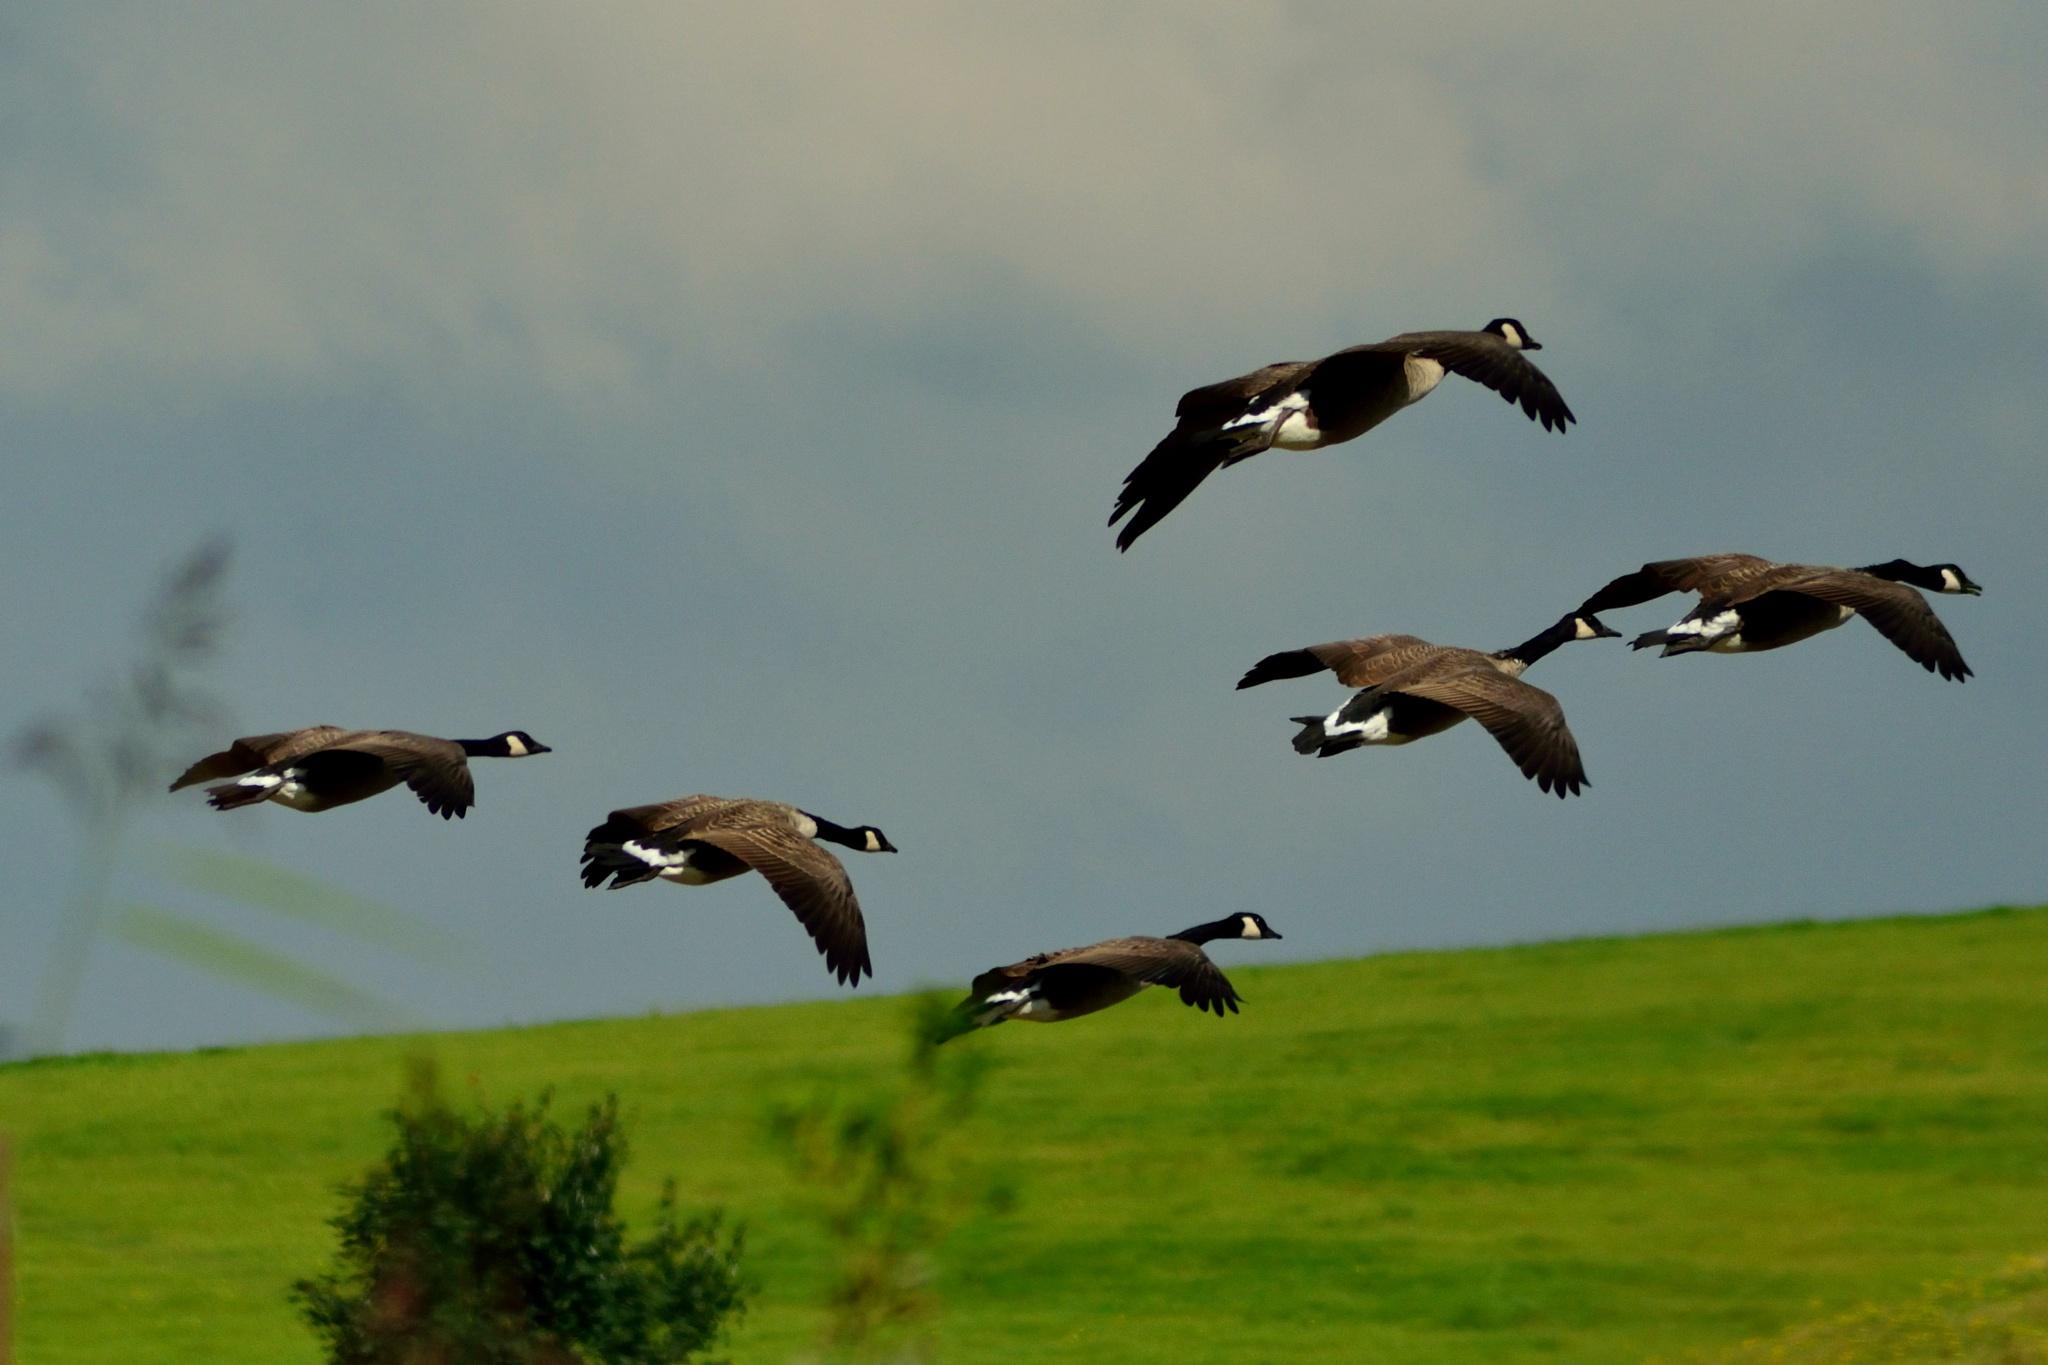 Canadeze ganzen / Canadean geese by Henk Meima